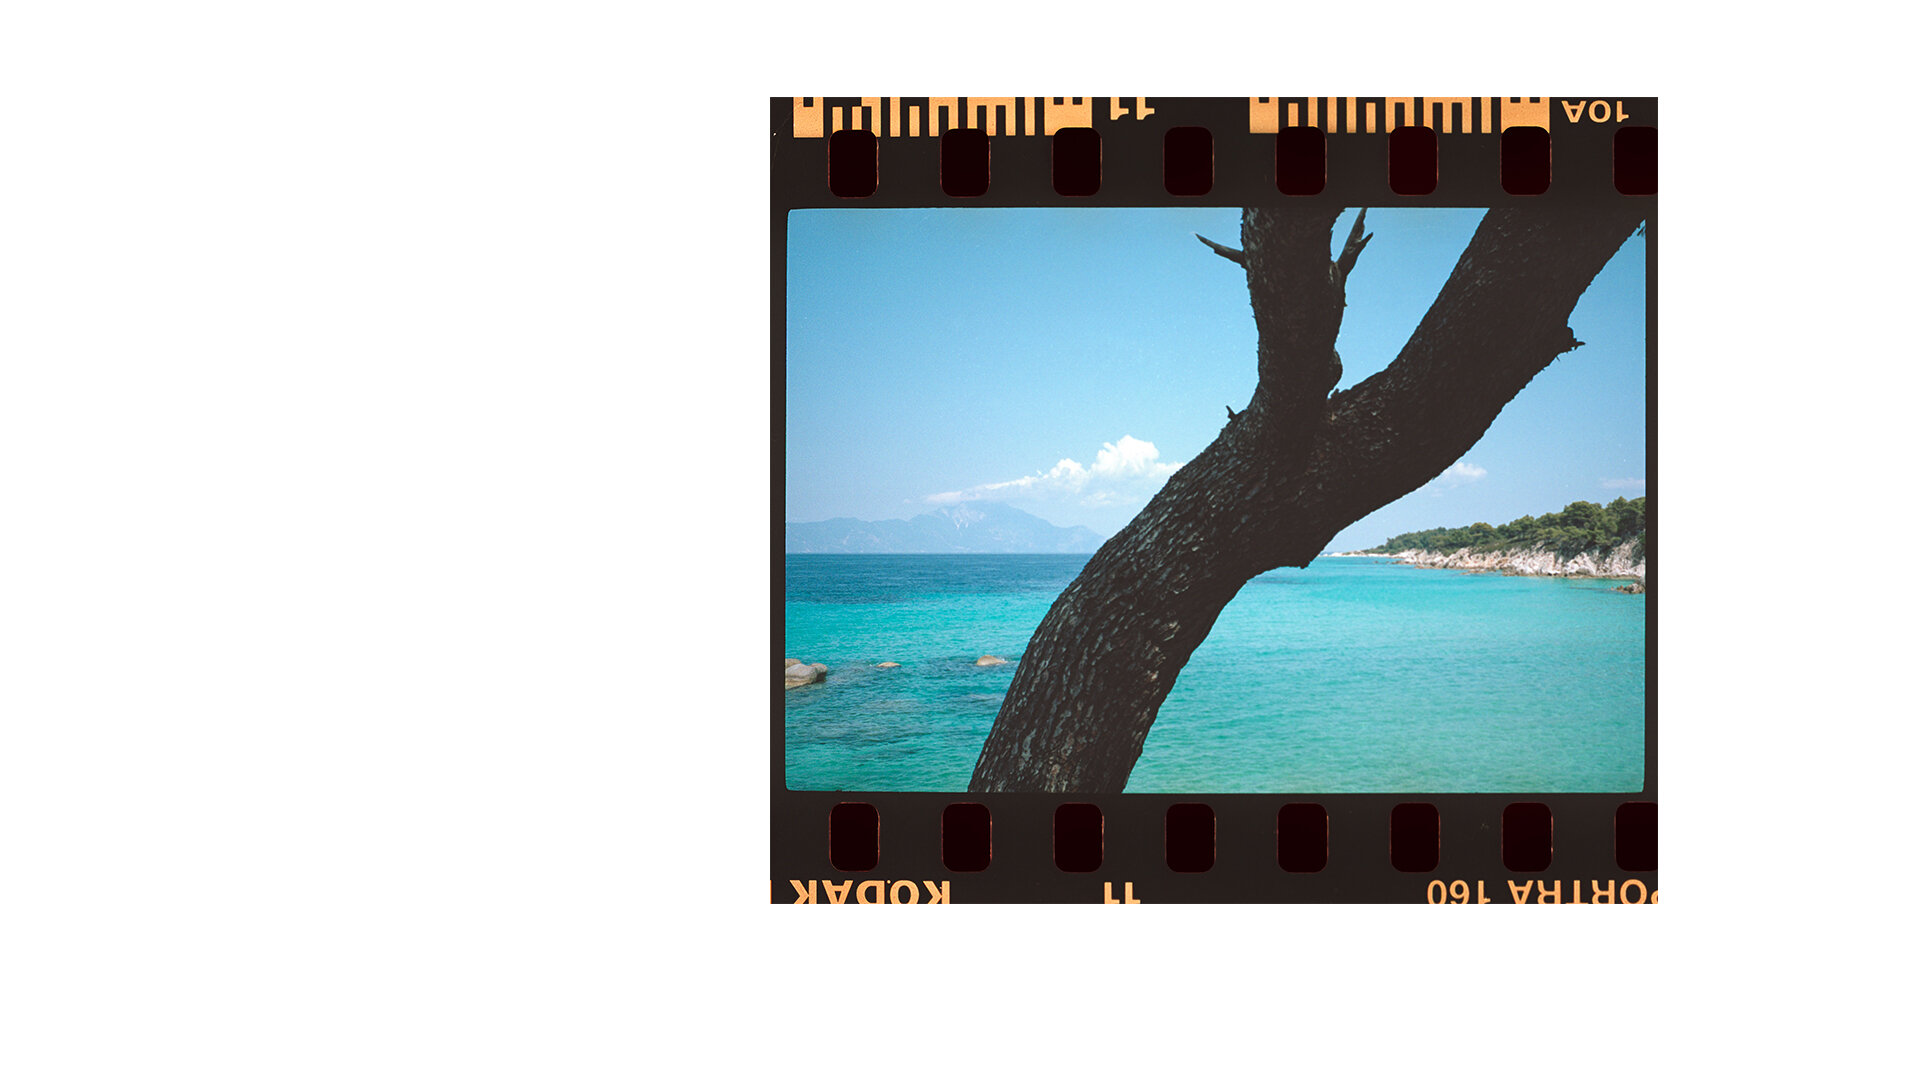 toby-butler-photo-tobybutlerphoto-lifestylephotography-travel-travelphotography-lifestyle-tourism-greece-film-35mm-magazine-europe-mediterranean-ocean-1.jpg